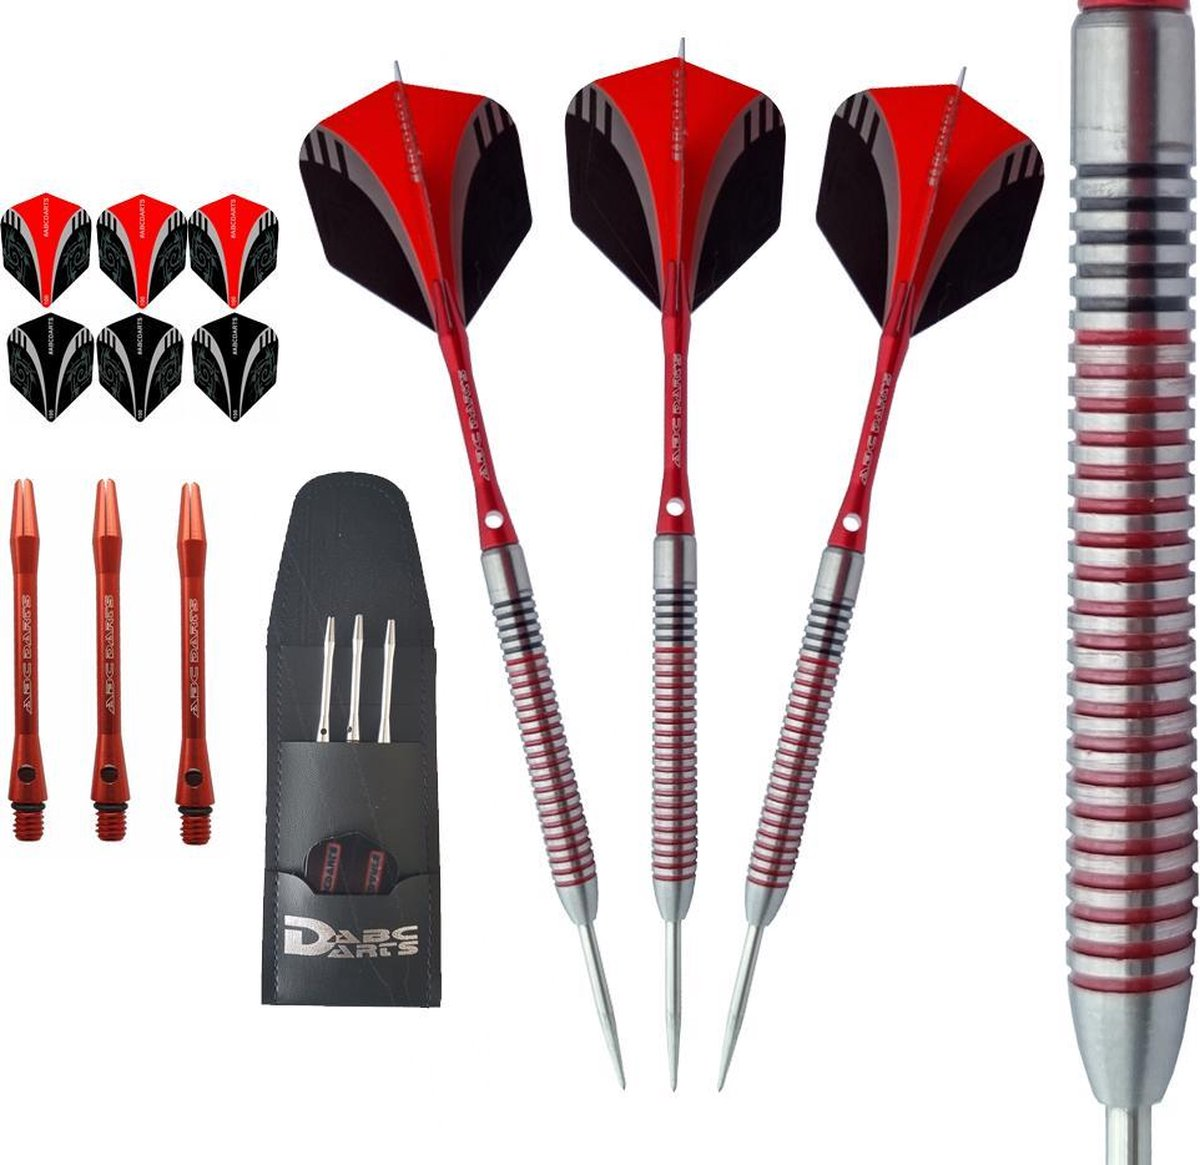 ABC Darts Professionele Dartpijlen - Red Dragonas Multi Ring - 24 gram